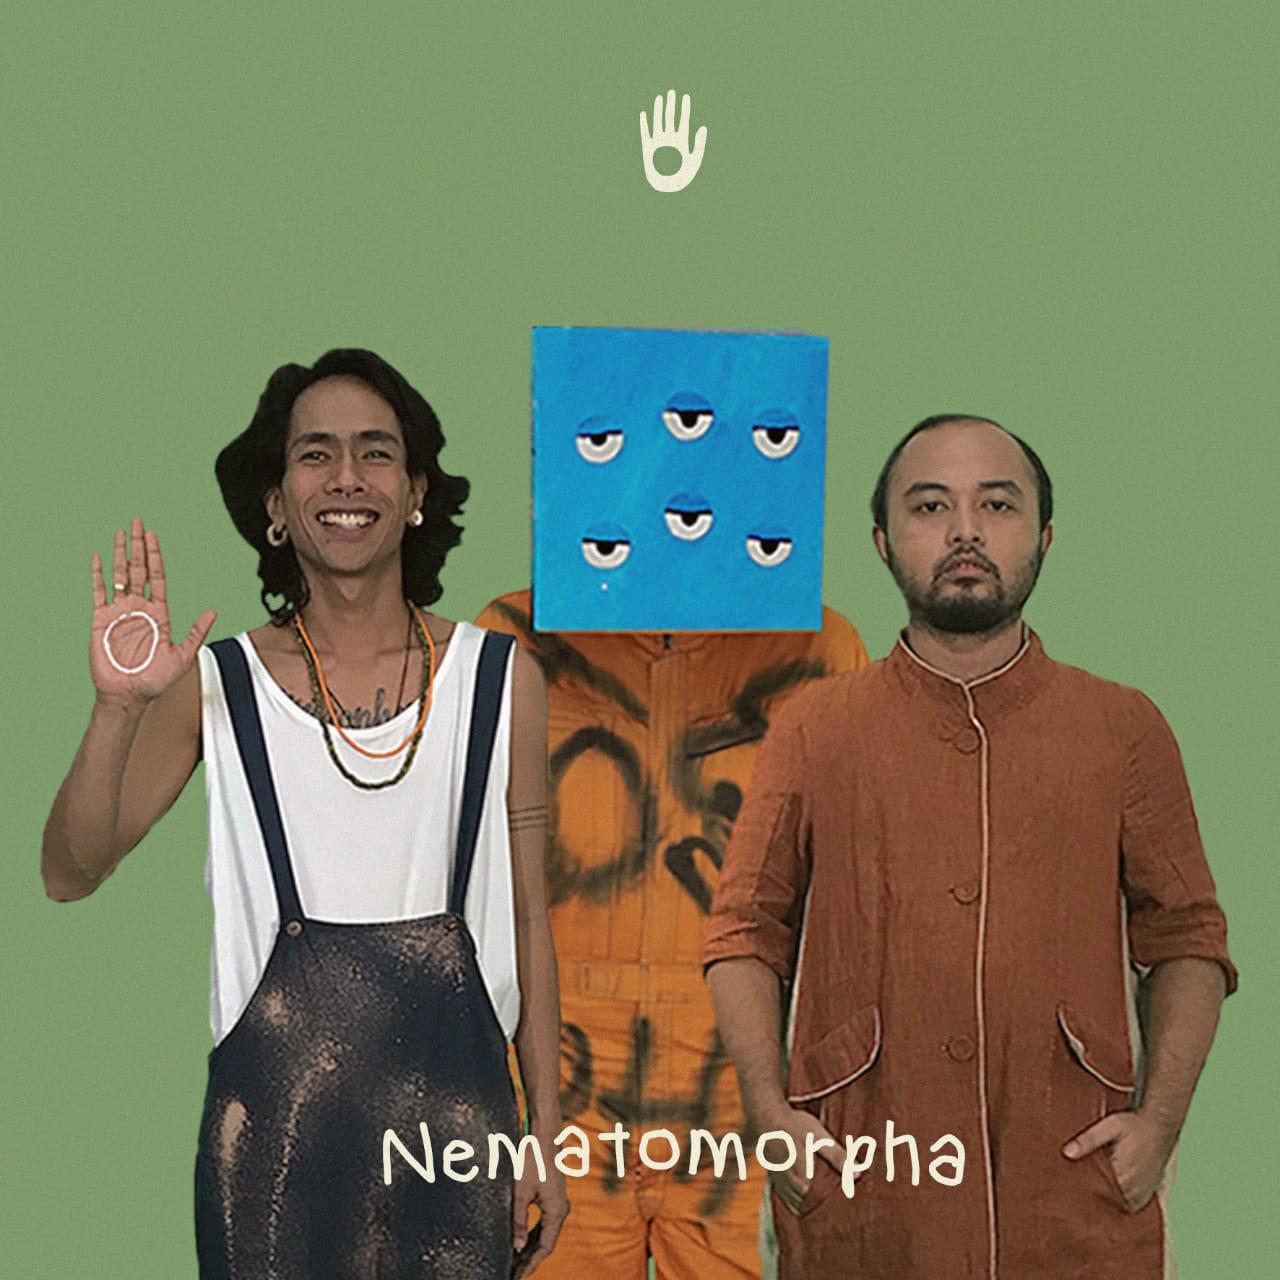 Fourtwnty Keluarkan Karya Terbaru 'Nematomorpha'